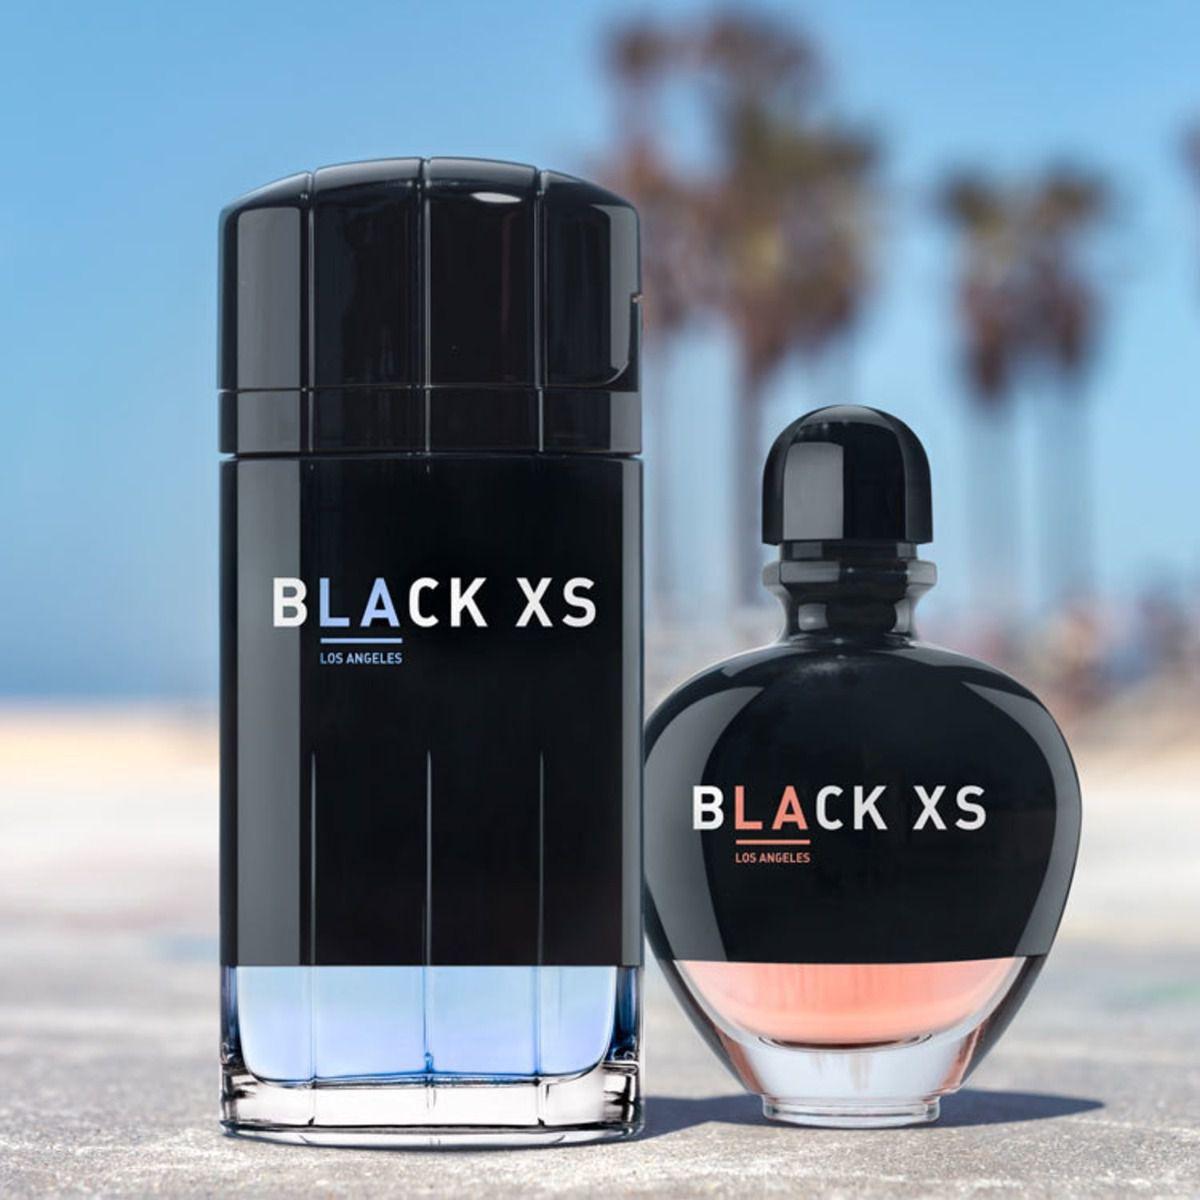 Black XS Los Angeles for Her Paco Rabanne -  Eau de Toilette Feminino 50ml